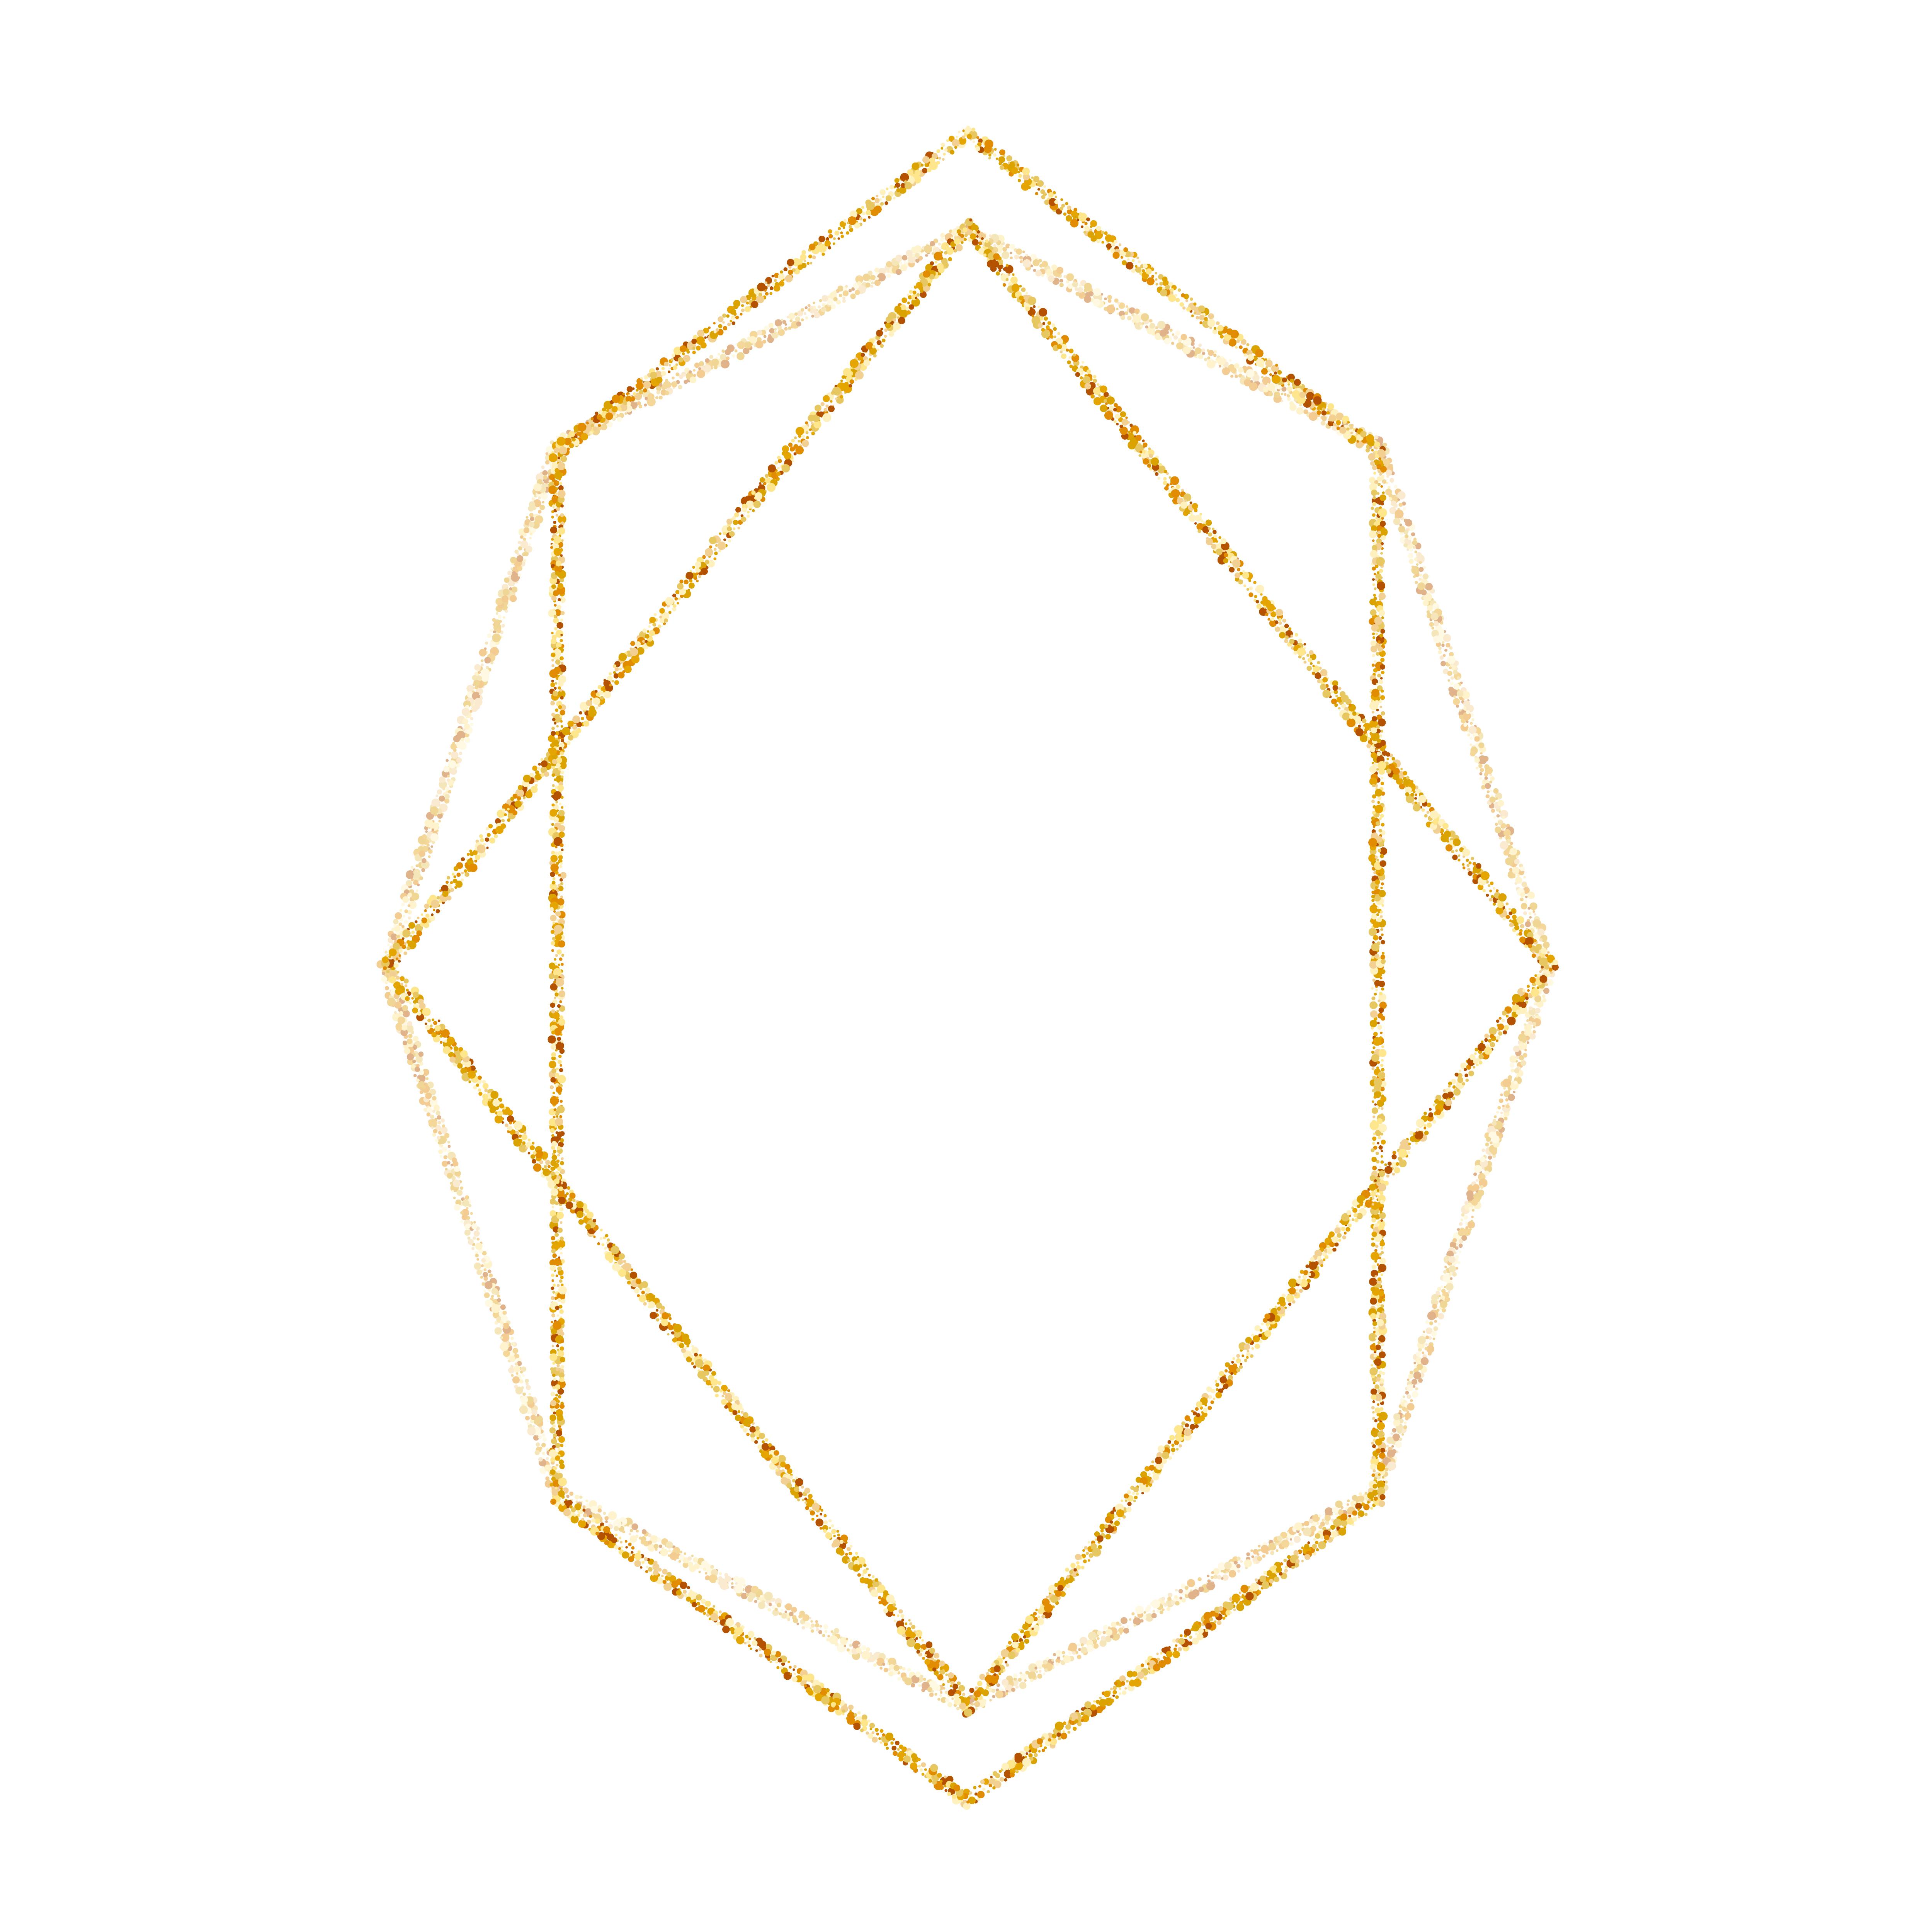 Geometric Gold Frame For Wedding Or Birthday Invitation